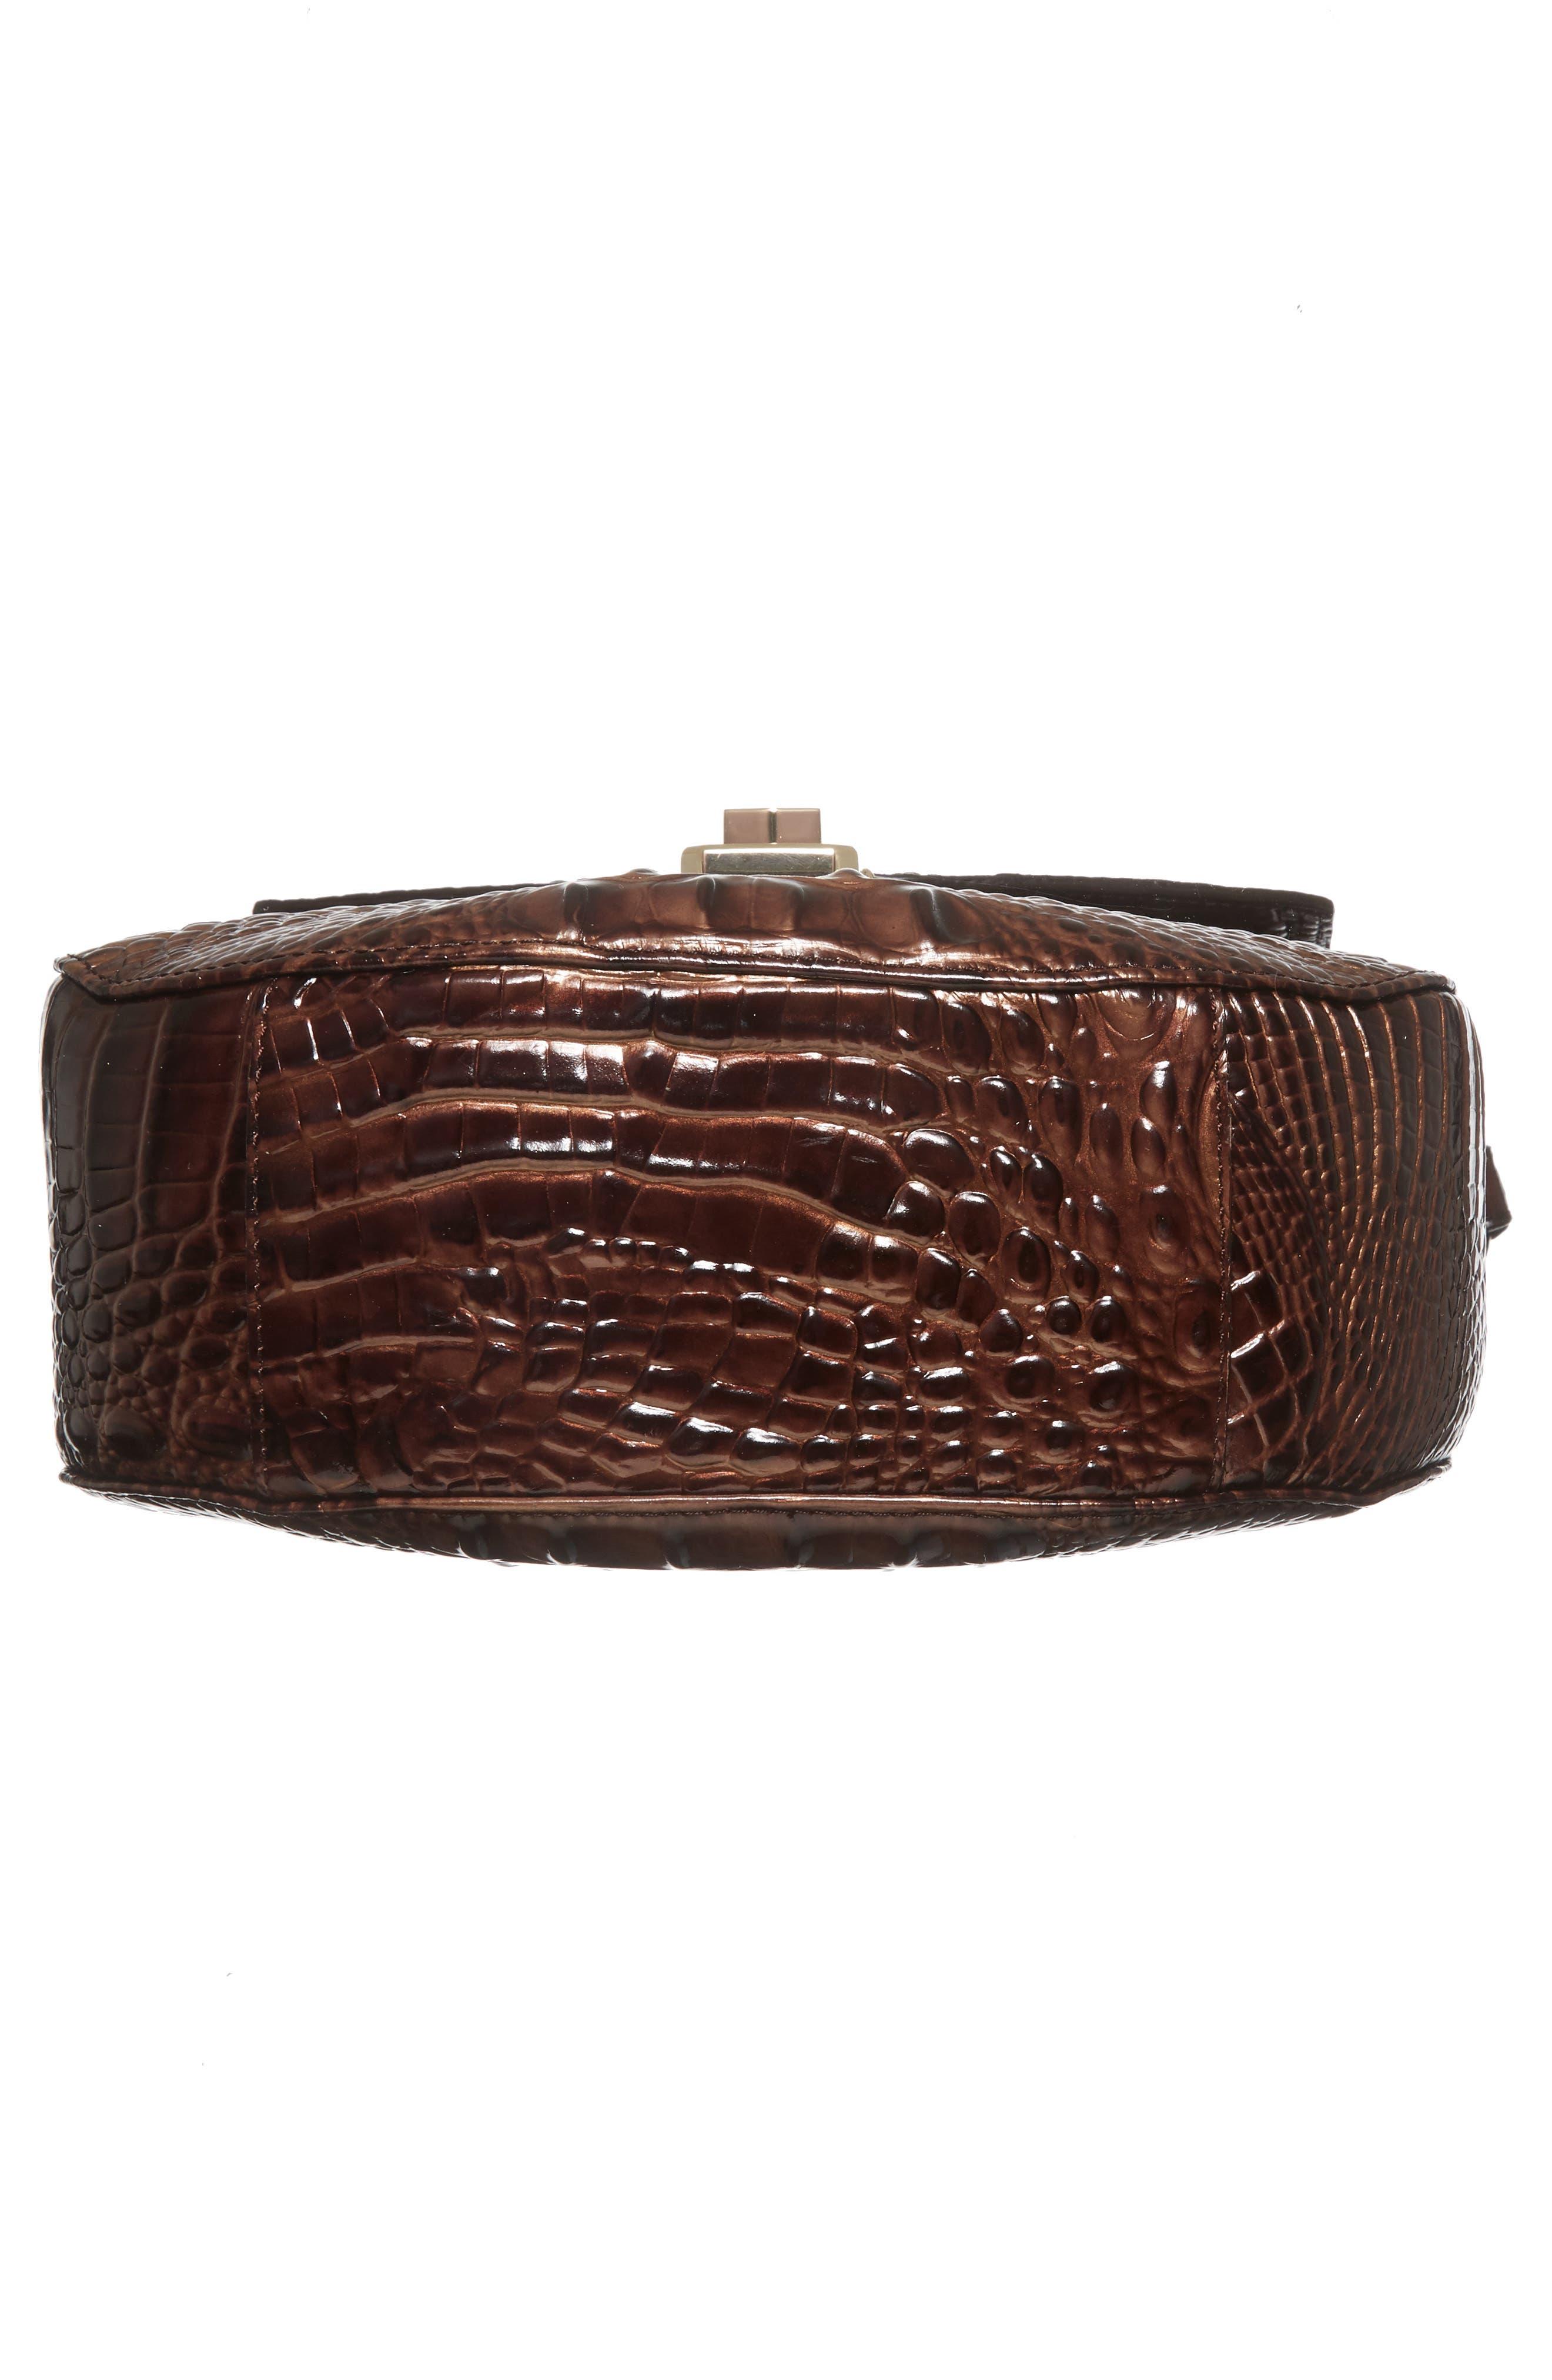 Melbourne - Lizzie Leather Crossbody Bag,                             Alternate thumbnail 28, color,